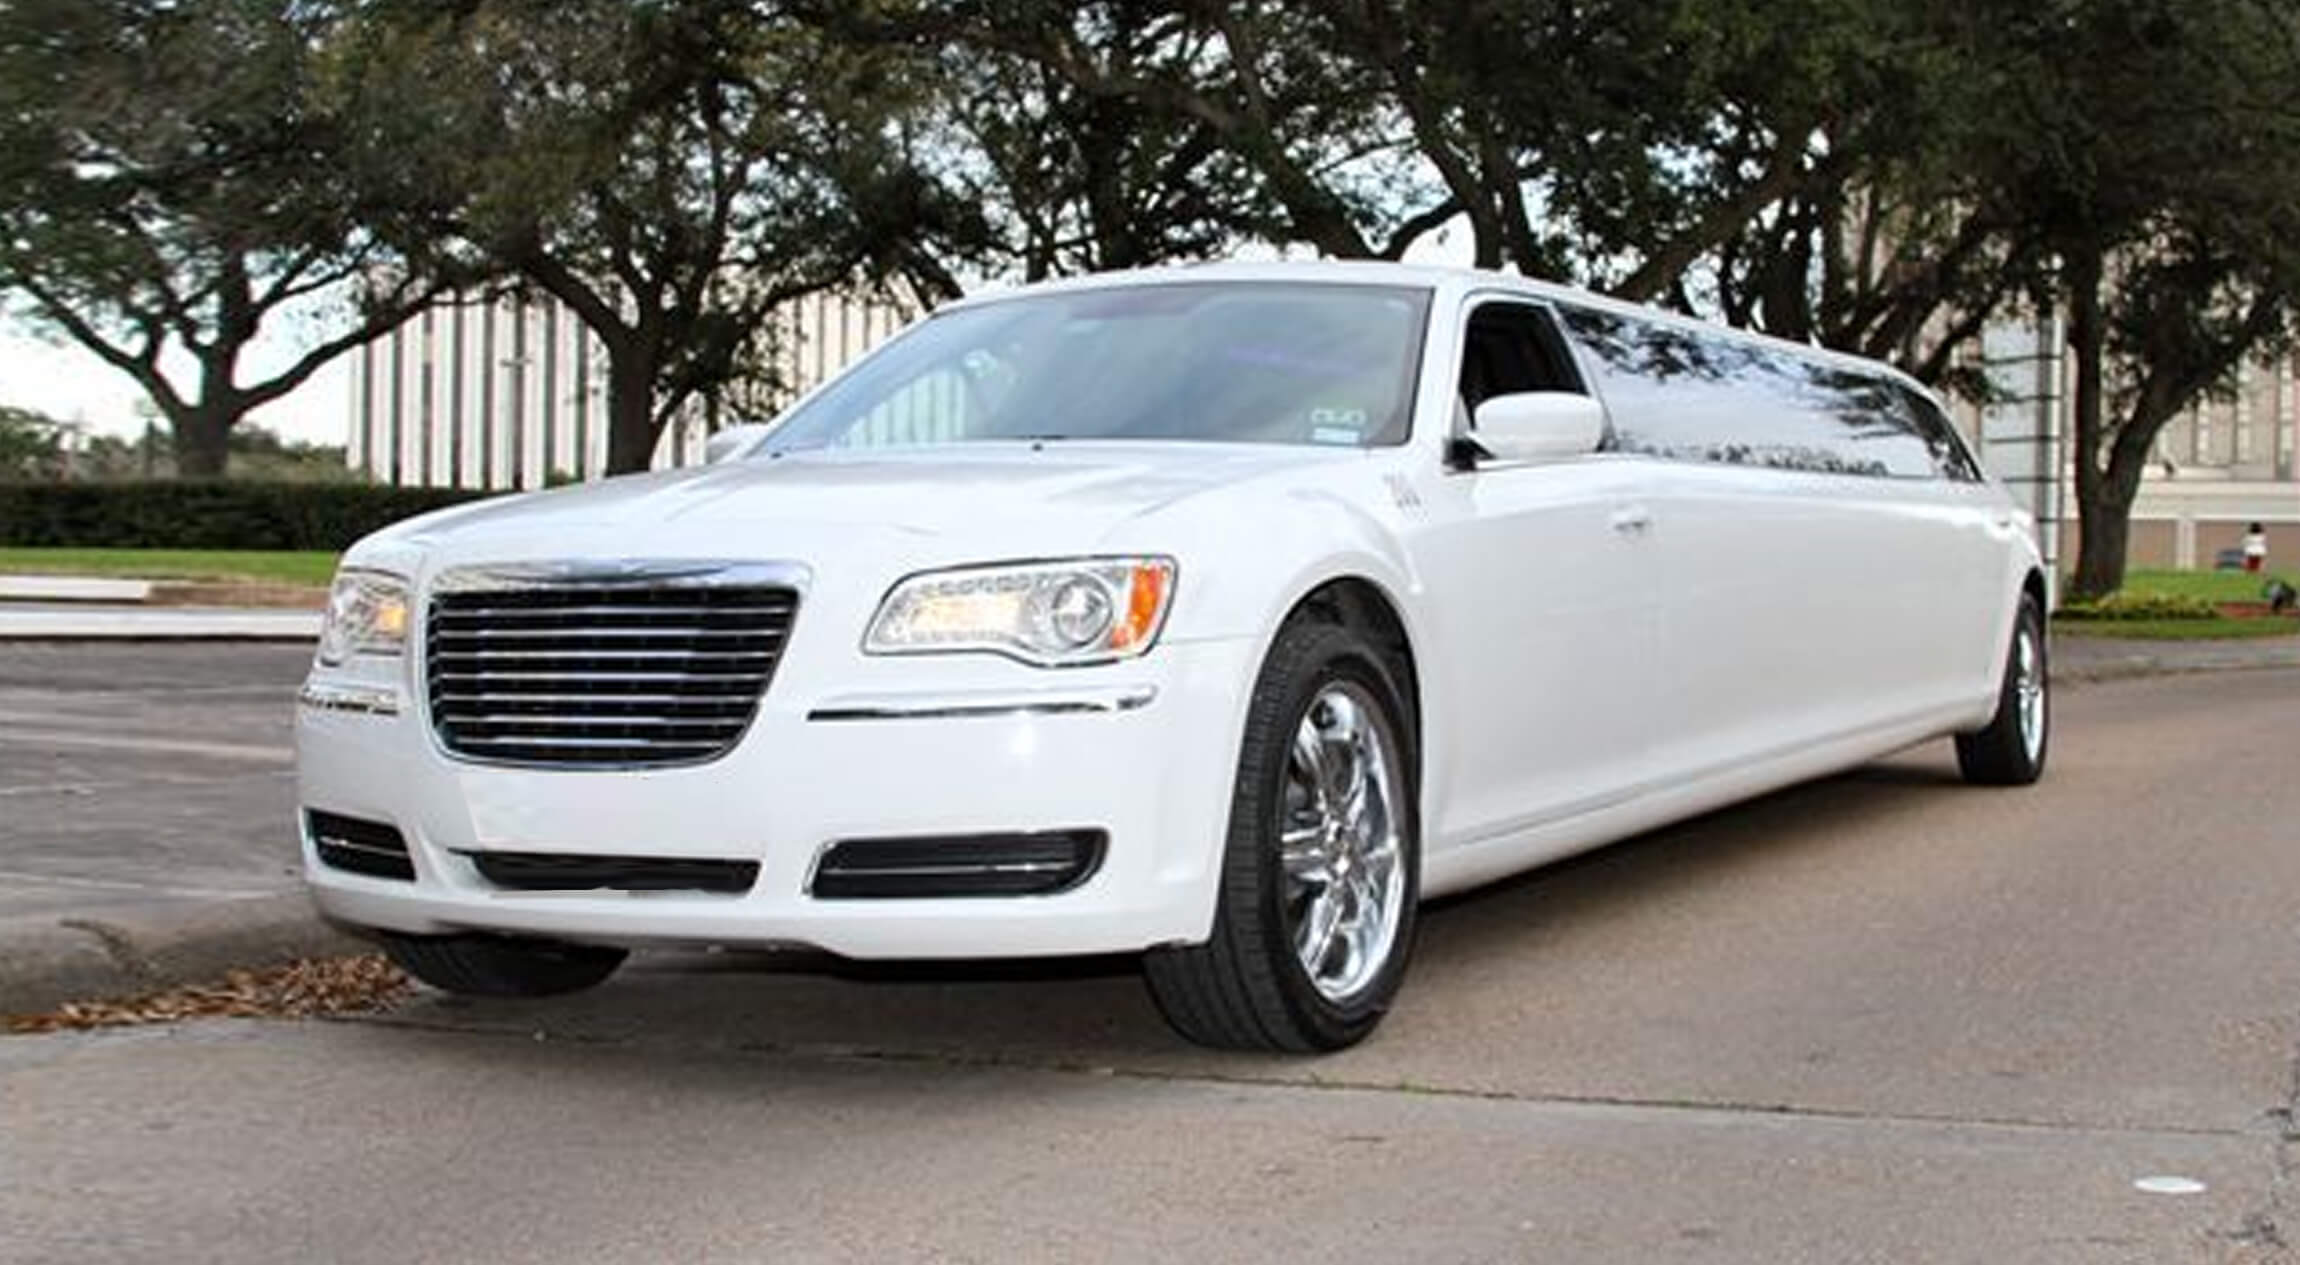 Limo10 3 Luxury Wedding Cars Sydney